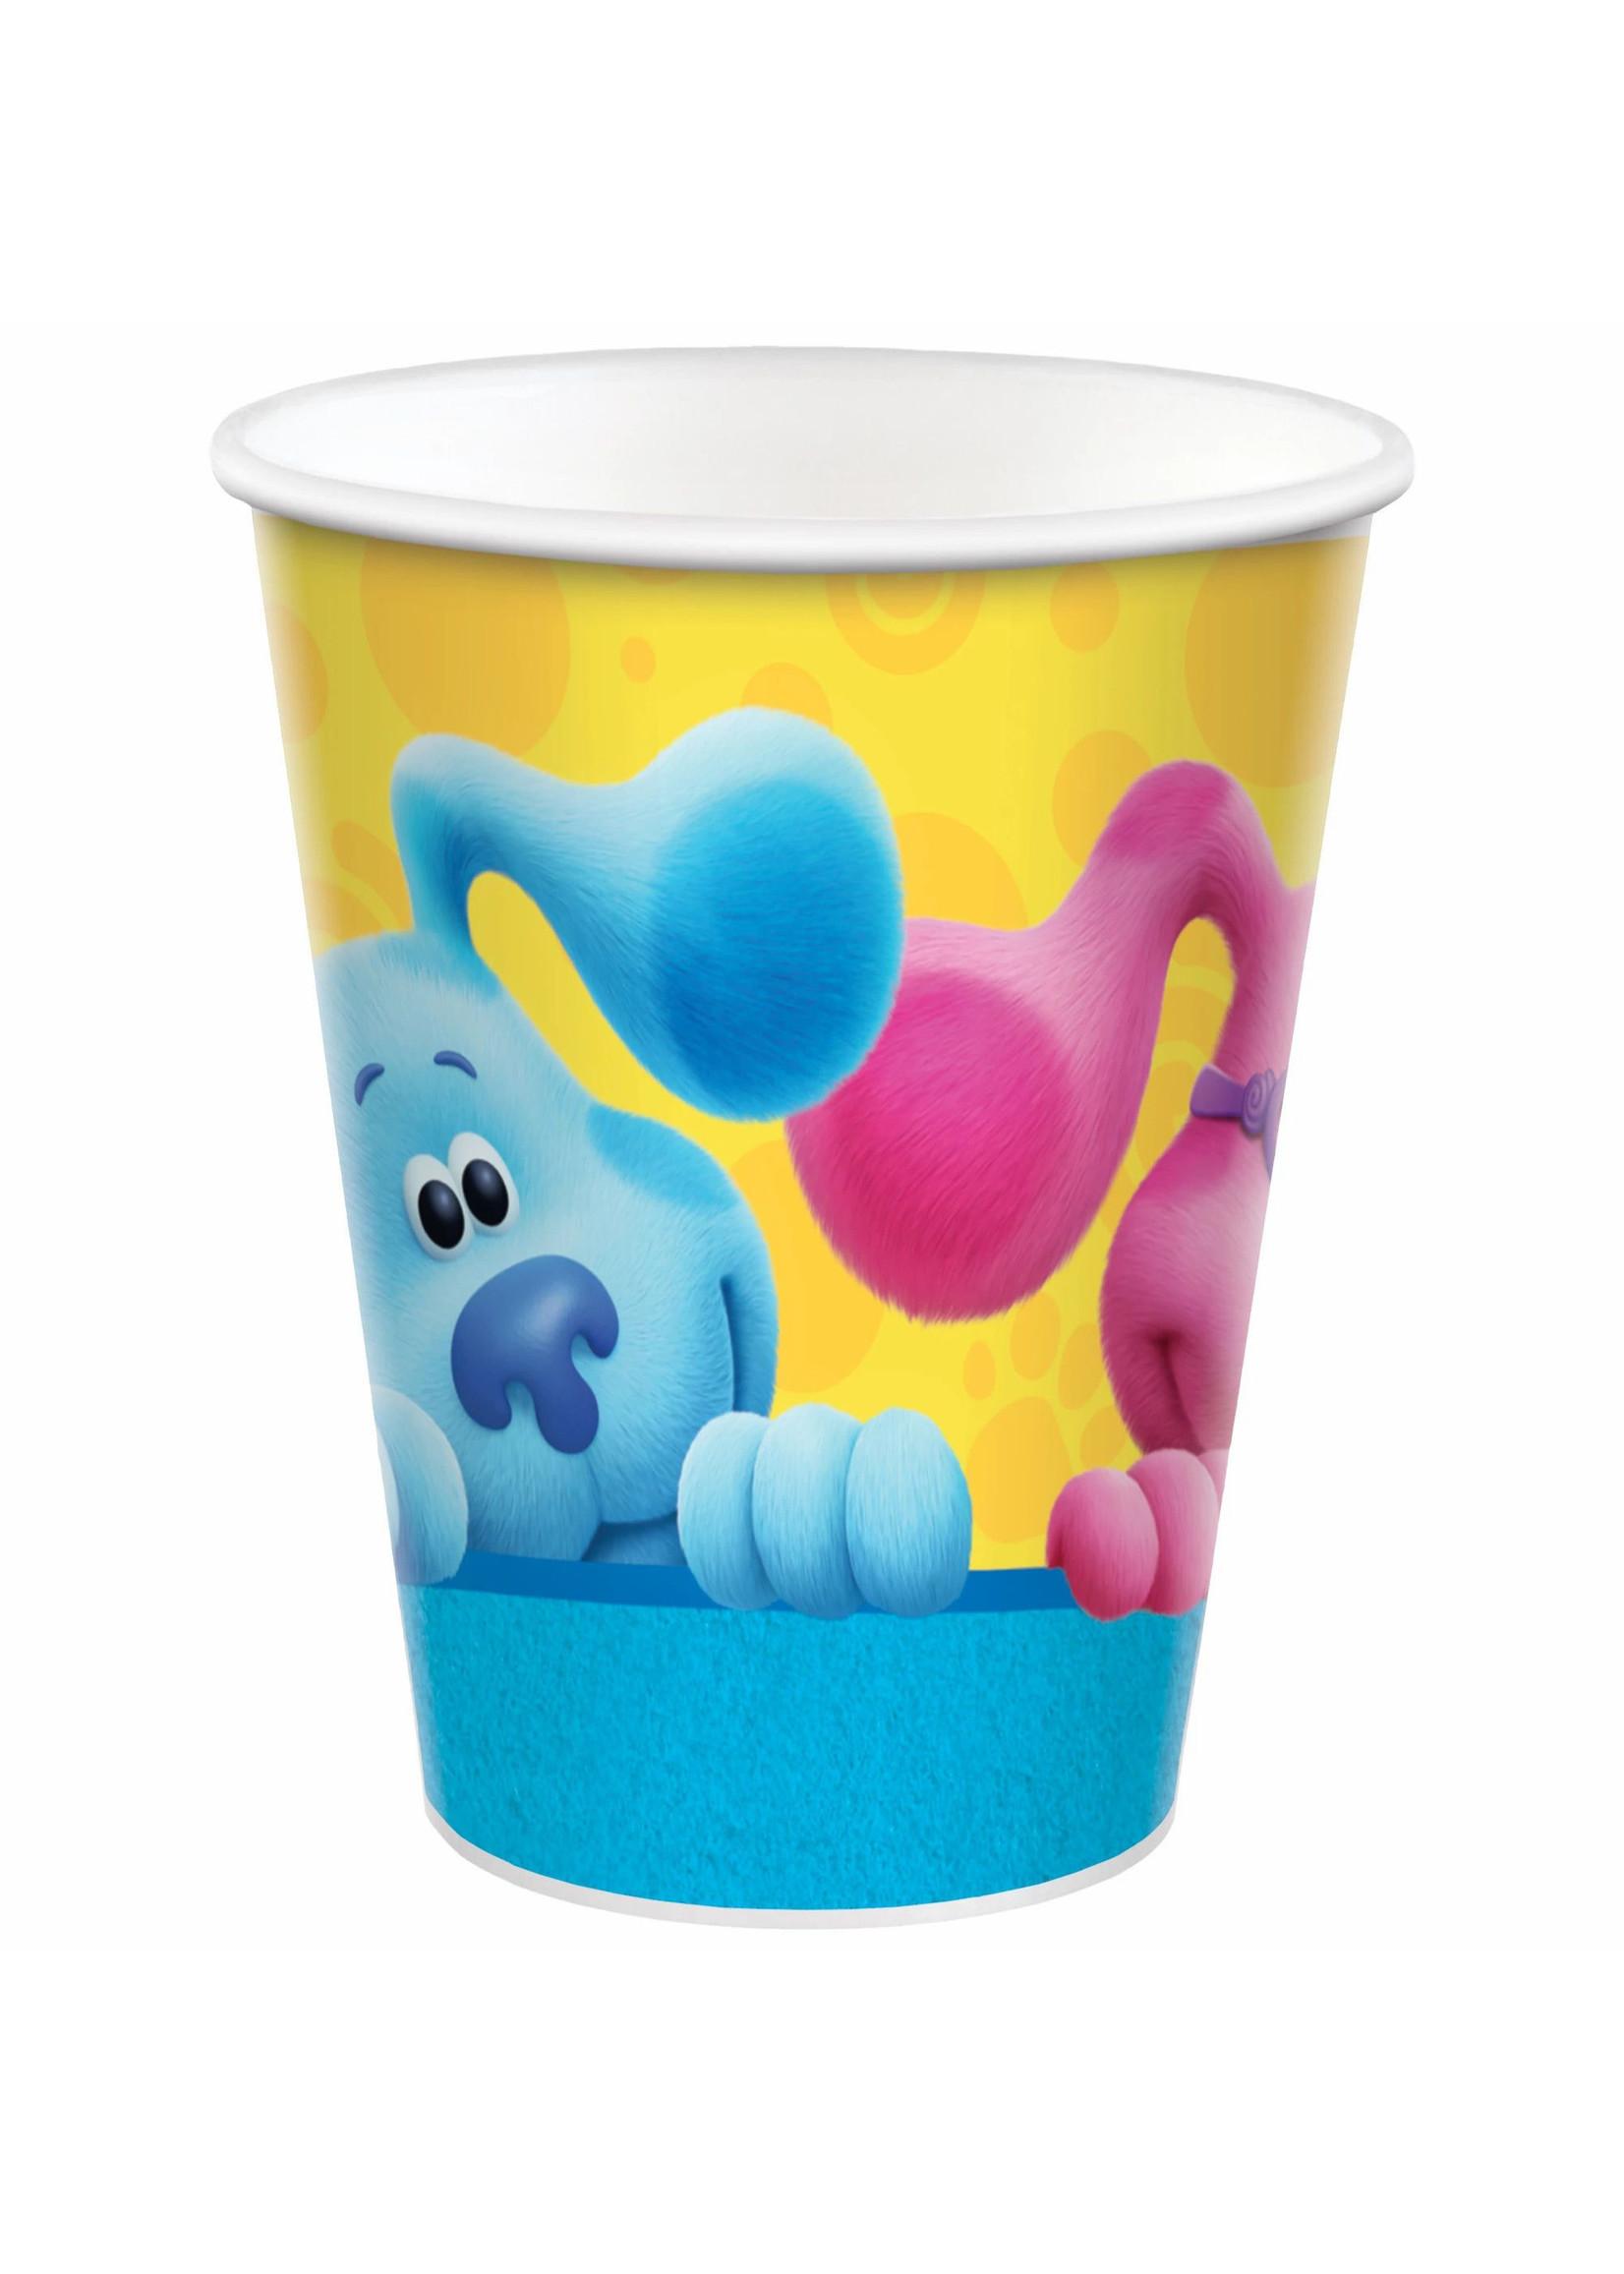 Blues Clues Cups, 9 oz. - 8ct